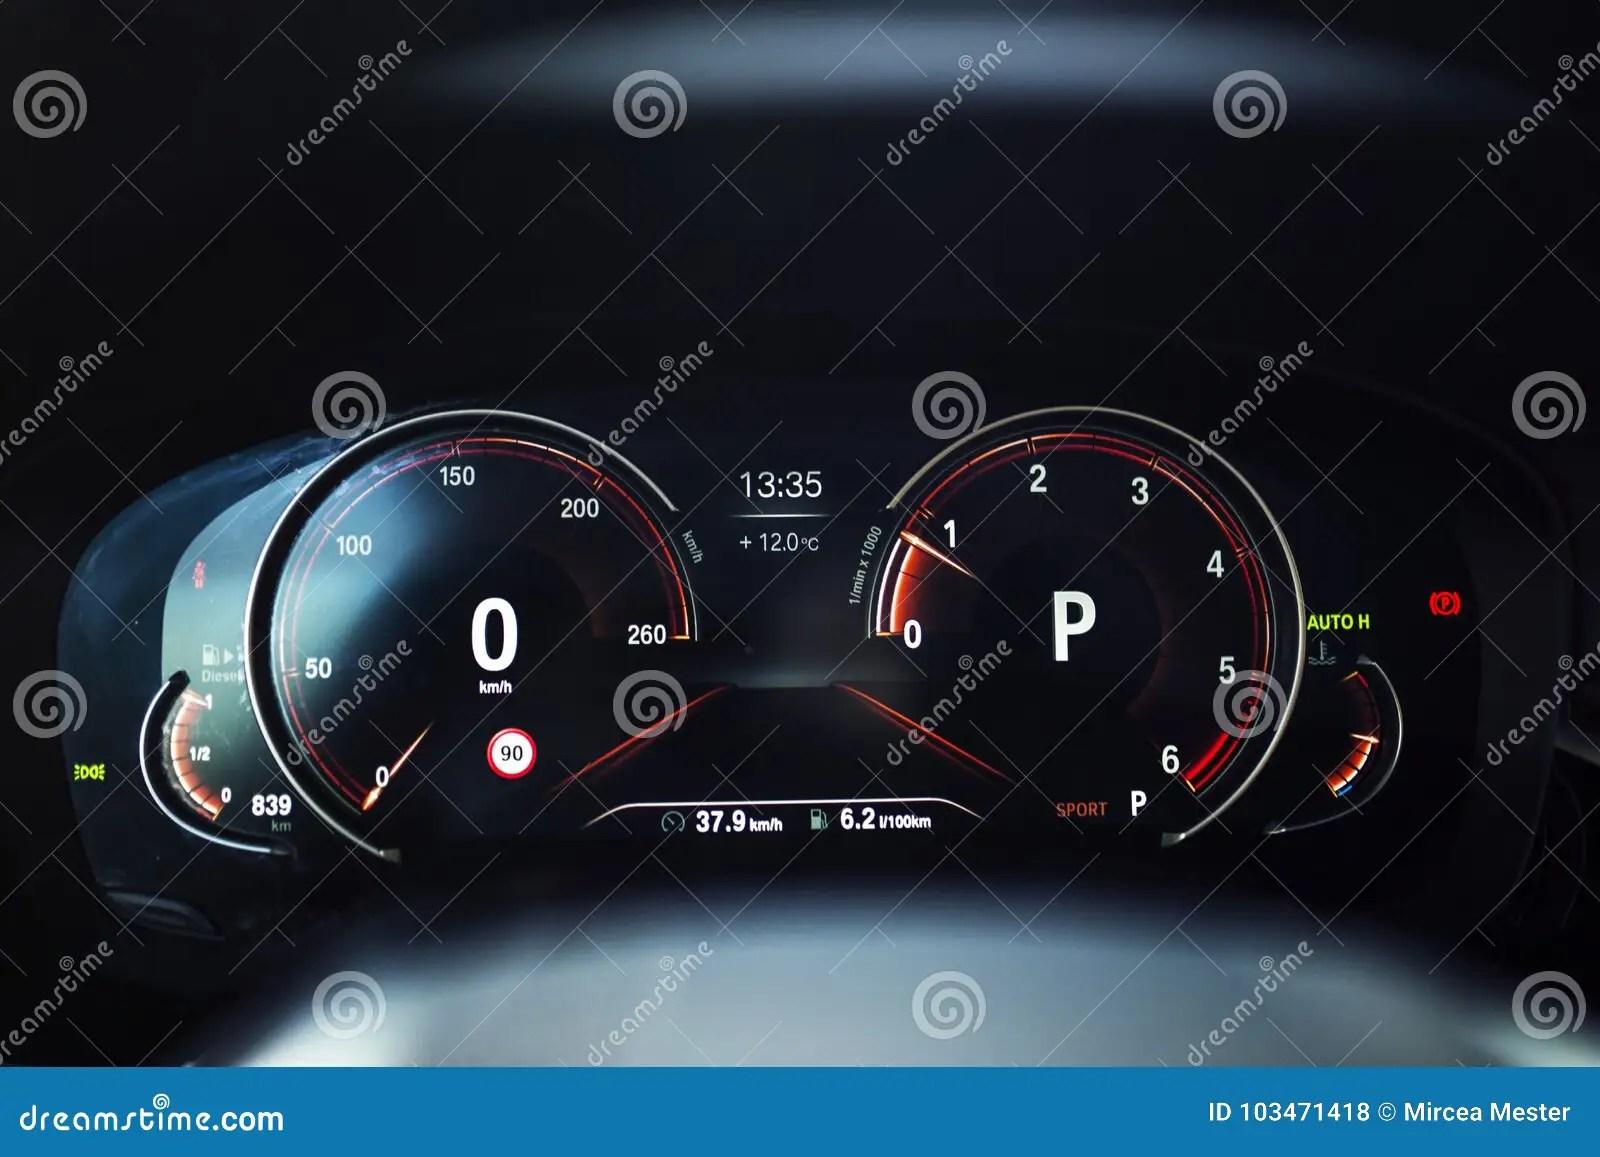 Car Interior Digital Instrument Panel With Sport Display